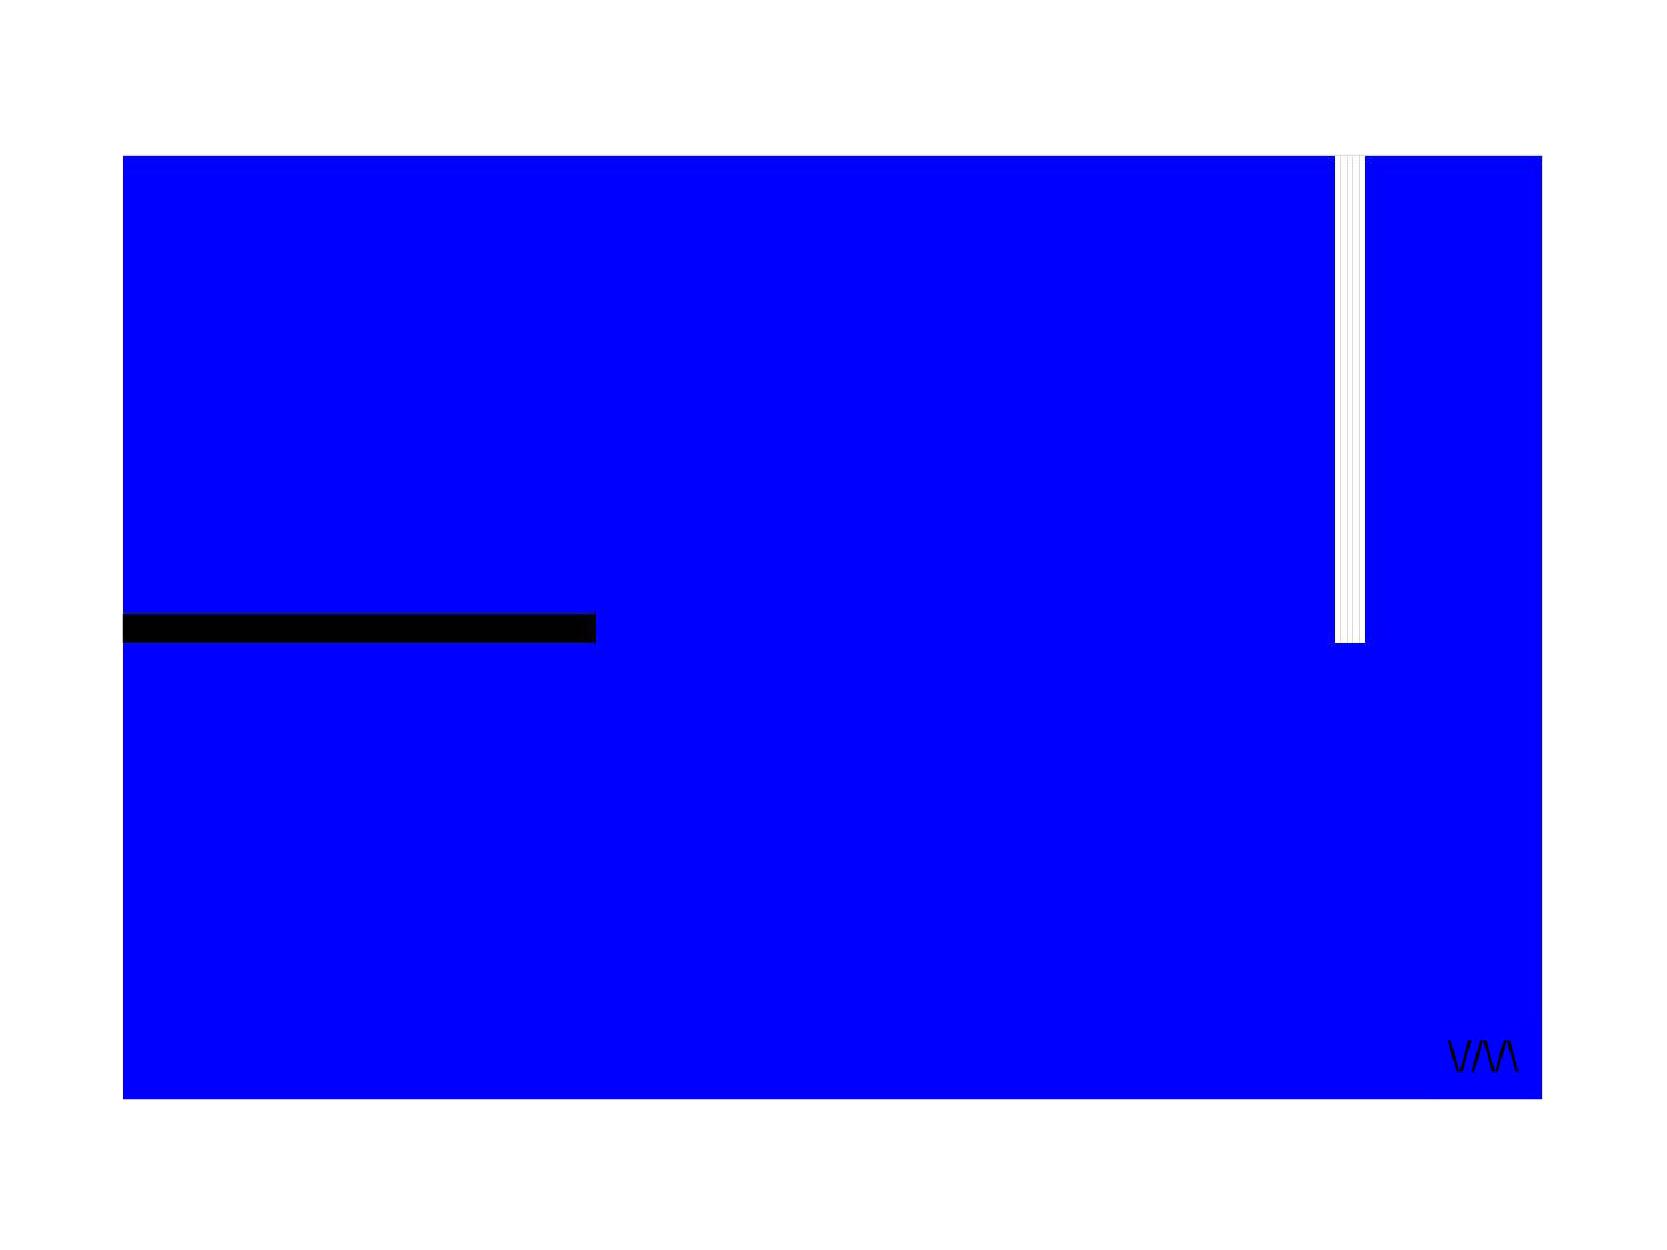 TAPETE-13.jpg